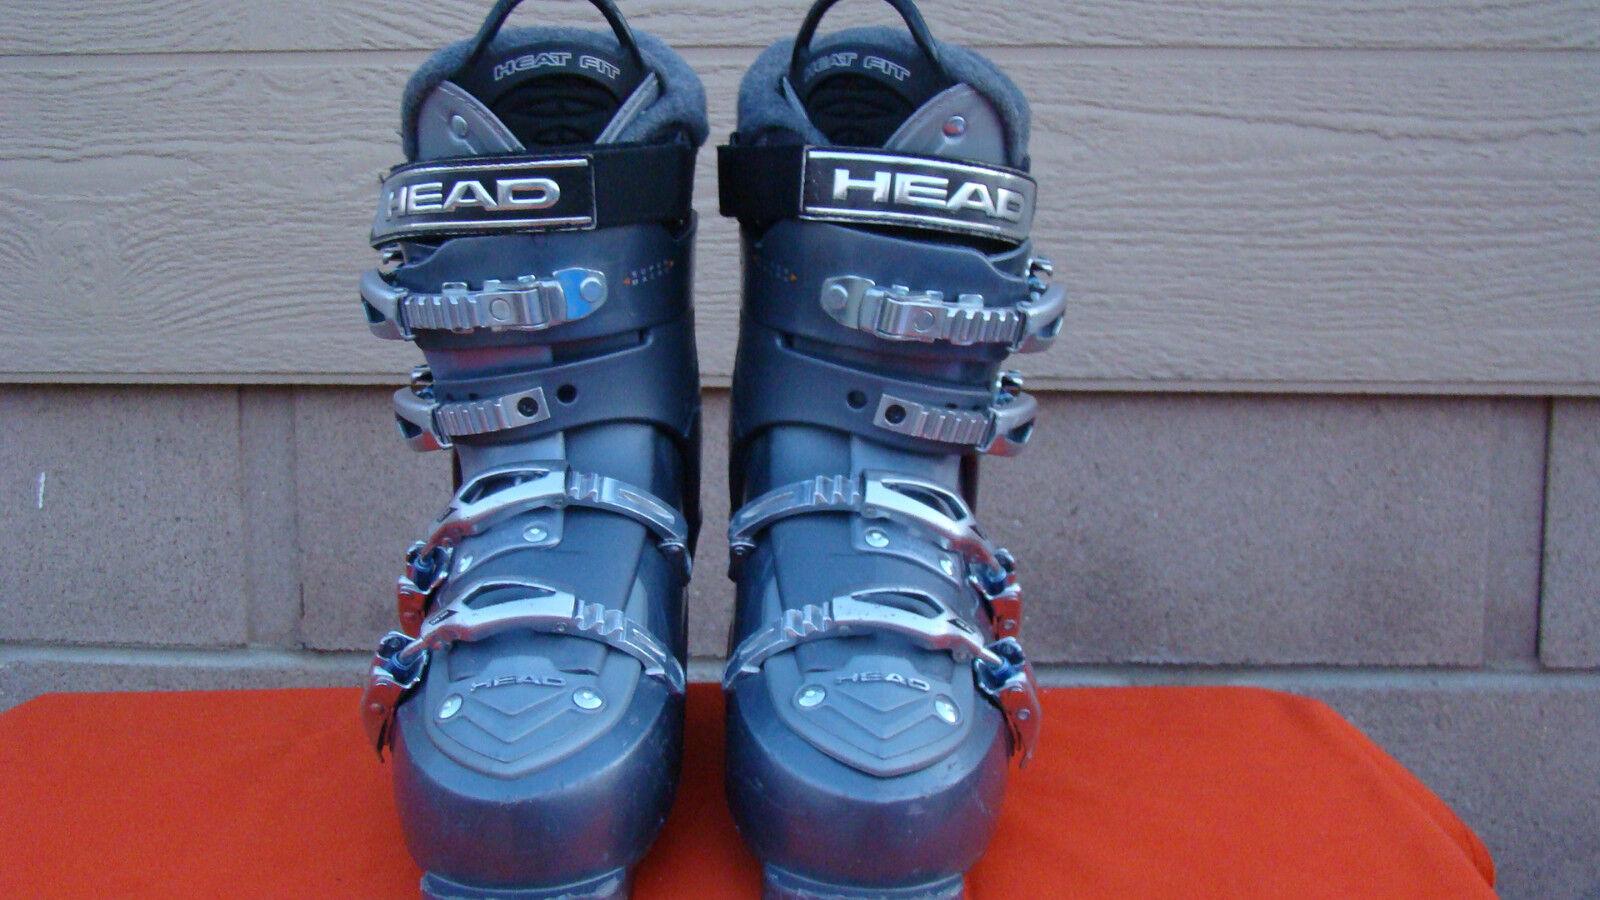 Head Ezon2 BYS HP Adult Downhill Ski Boots - Size  260 265 mm - Czech Republic